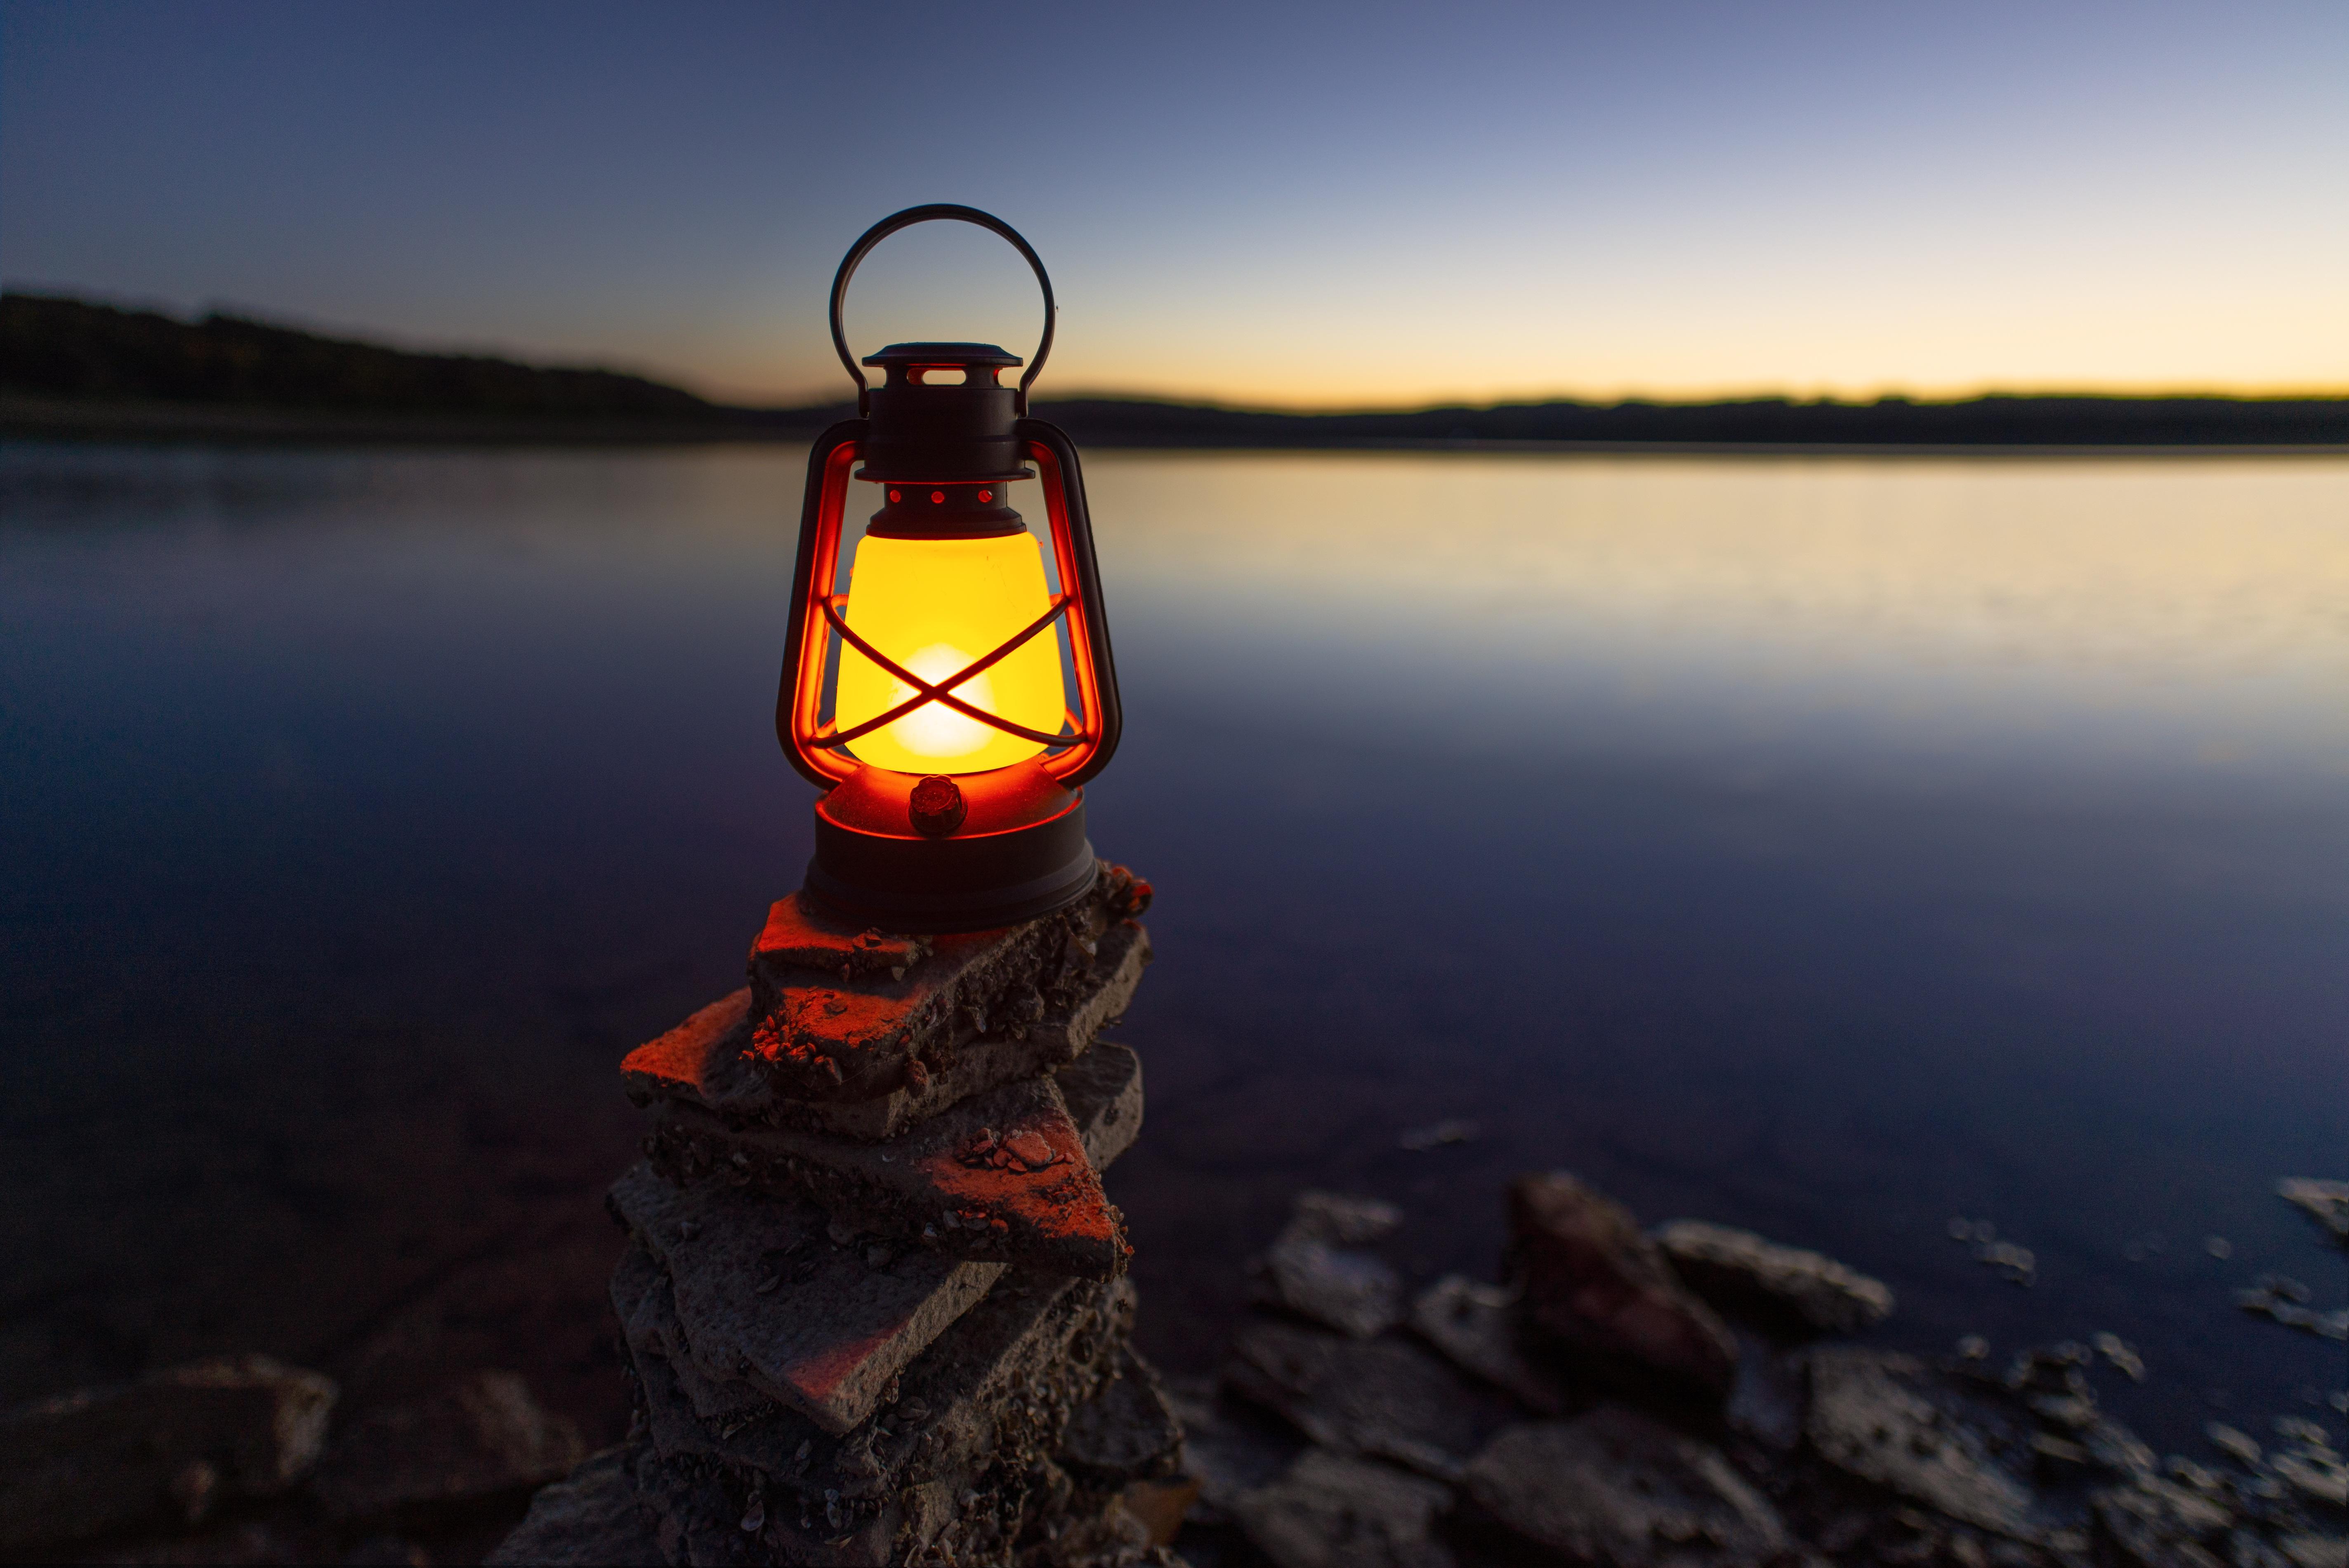 141442 download wallpaper Dark, Lamp, Lantern, Shine, Light, Stones, Lake, Shore, Bank screensavers and pictures for free